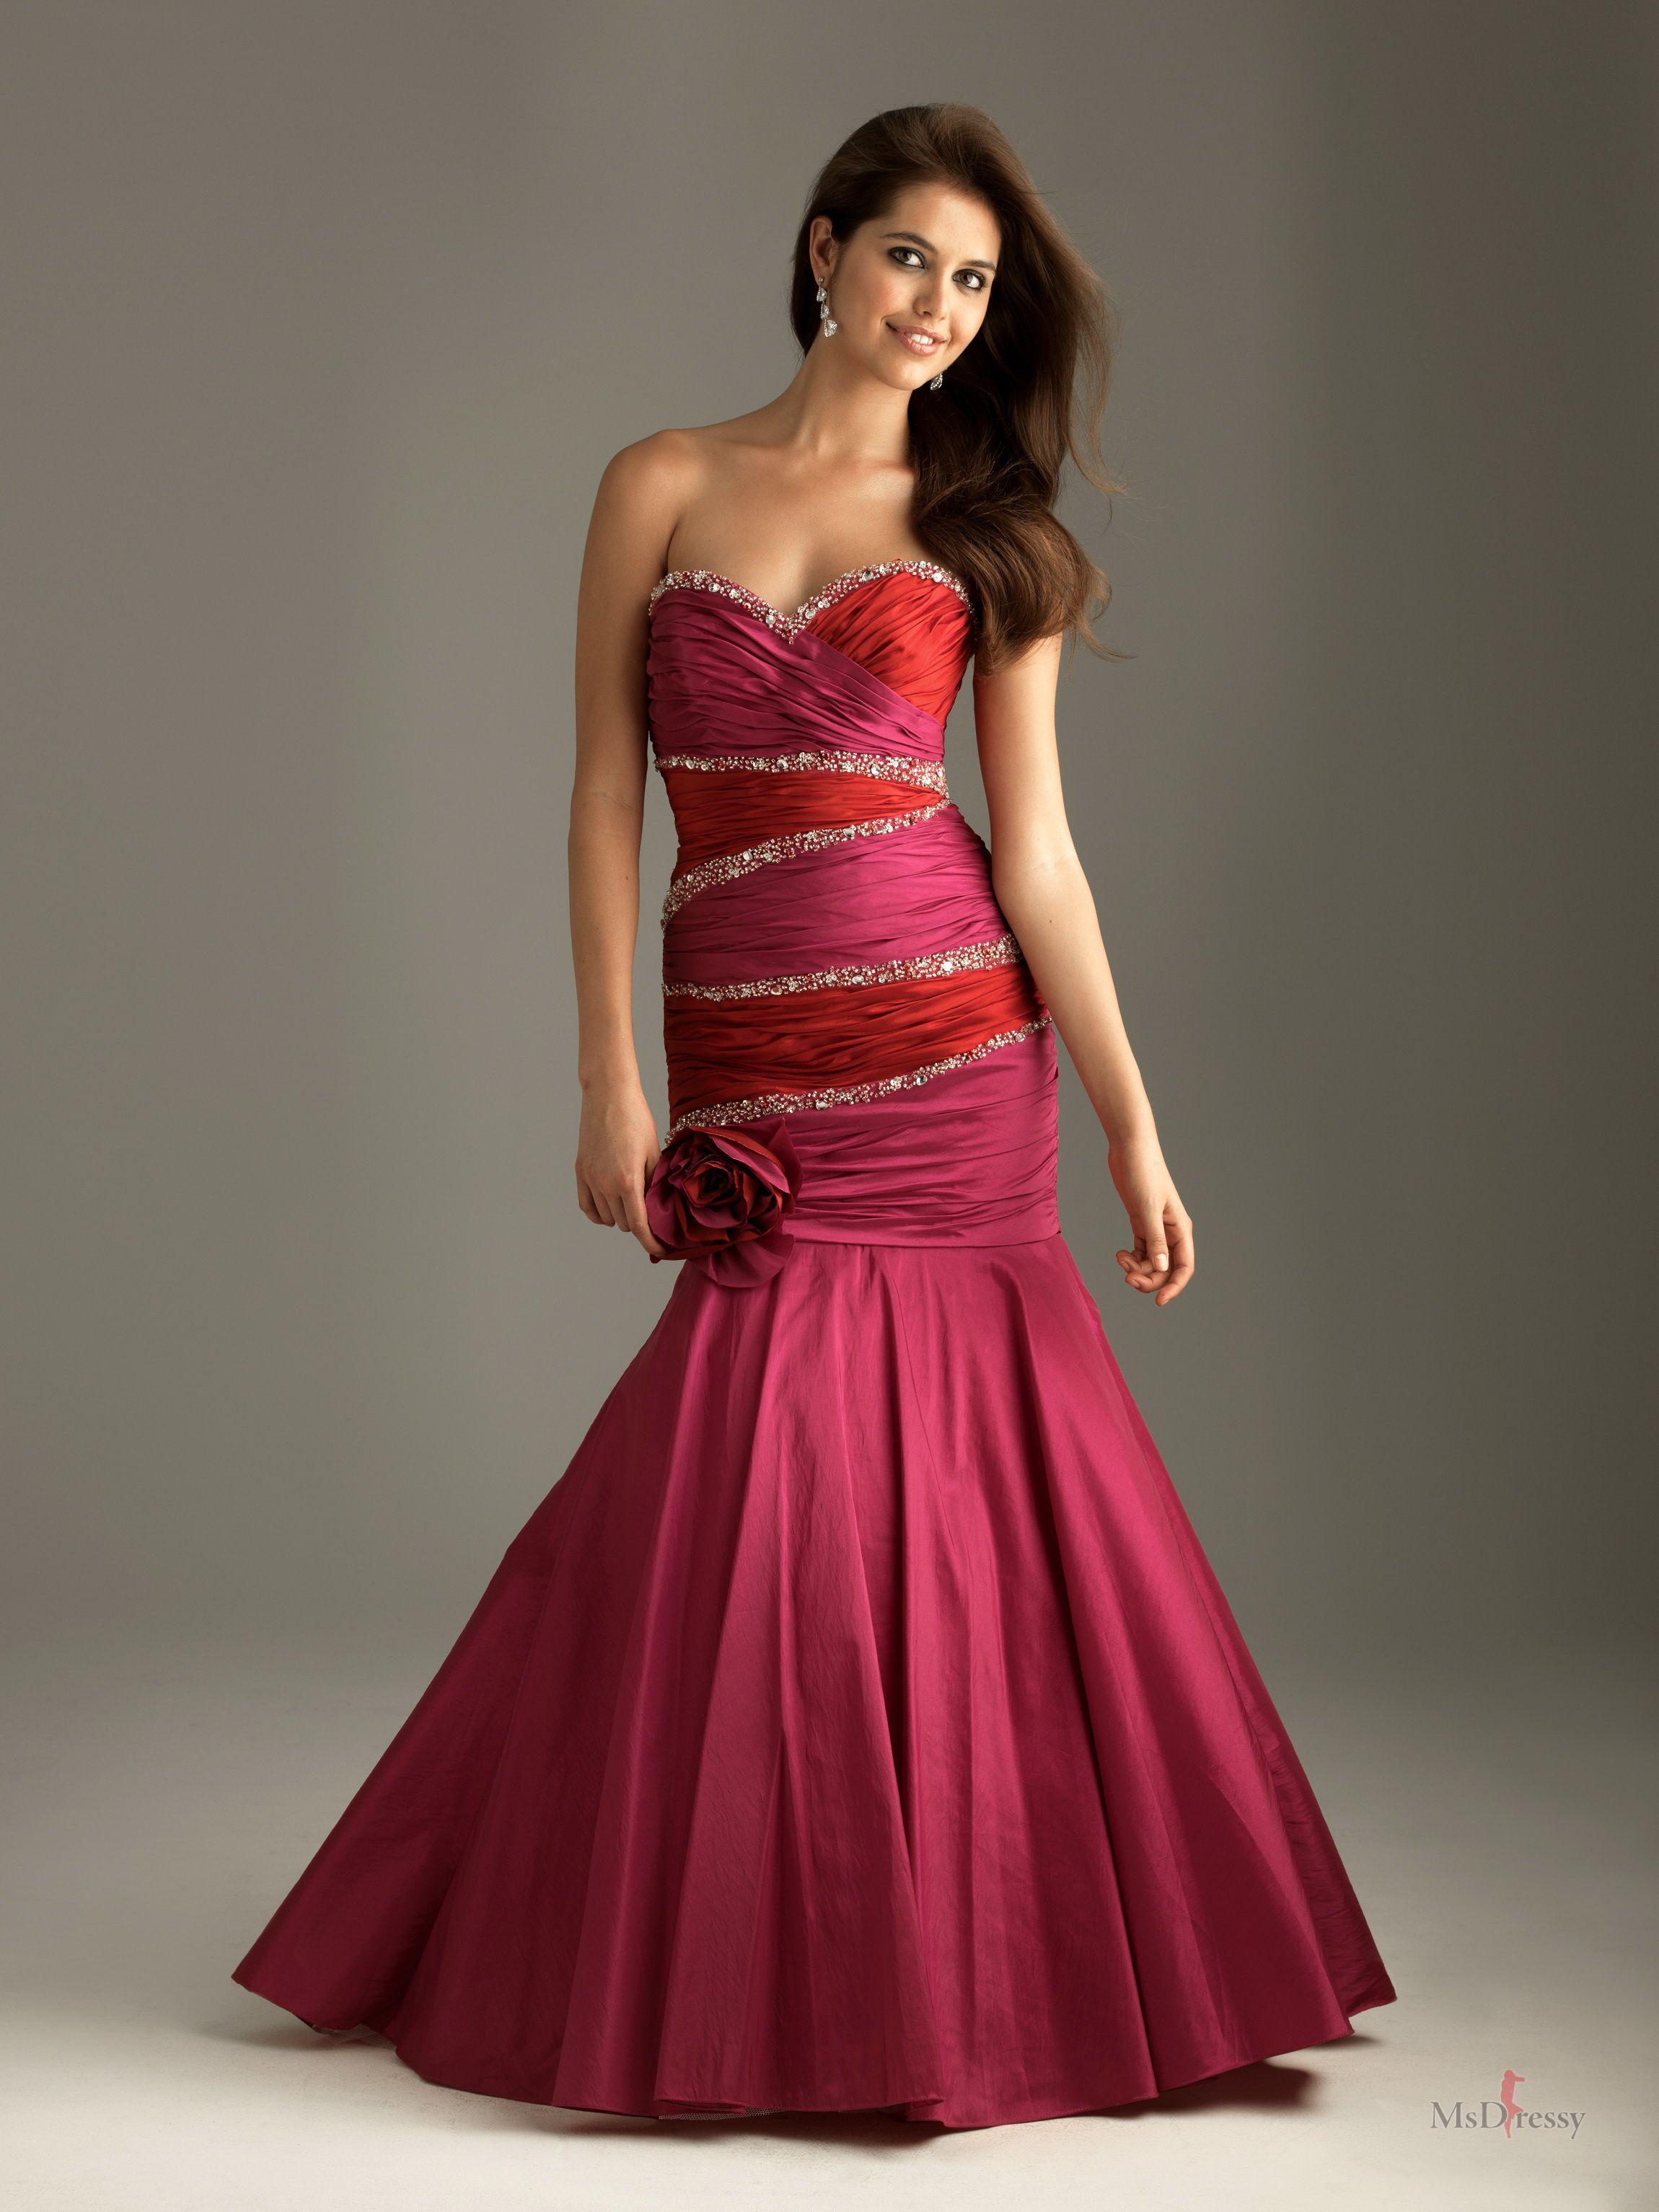 Mermaid design u romantic color d pinterest fashion lookbook